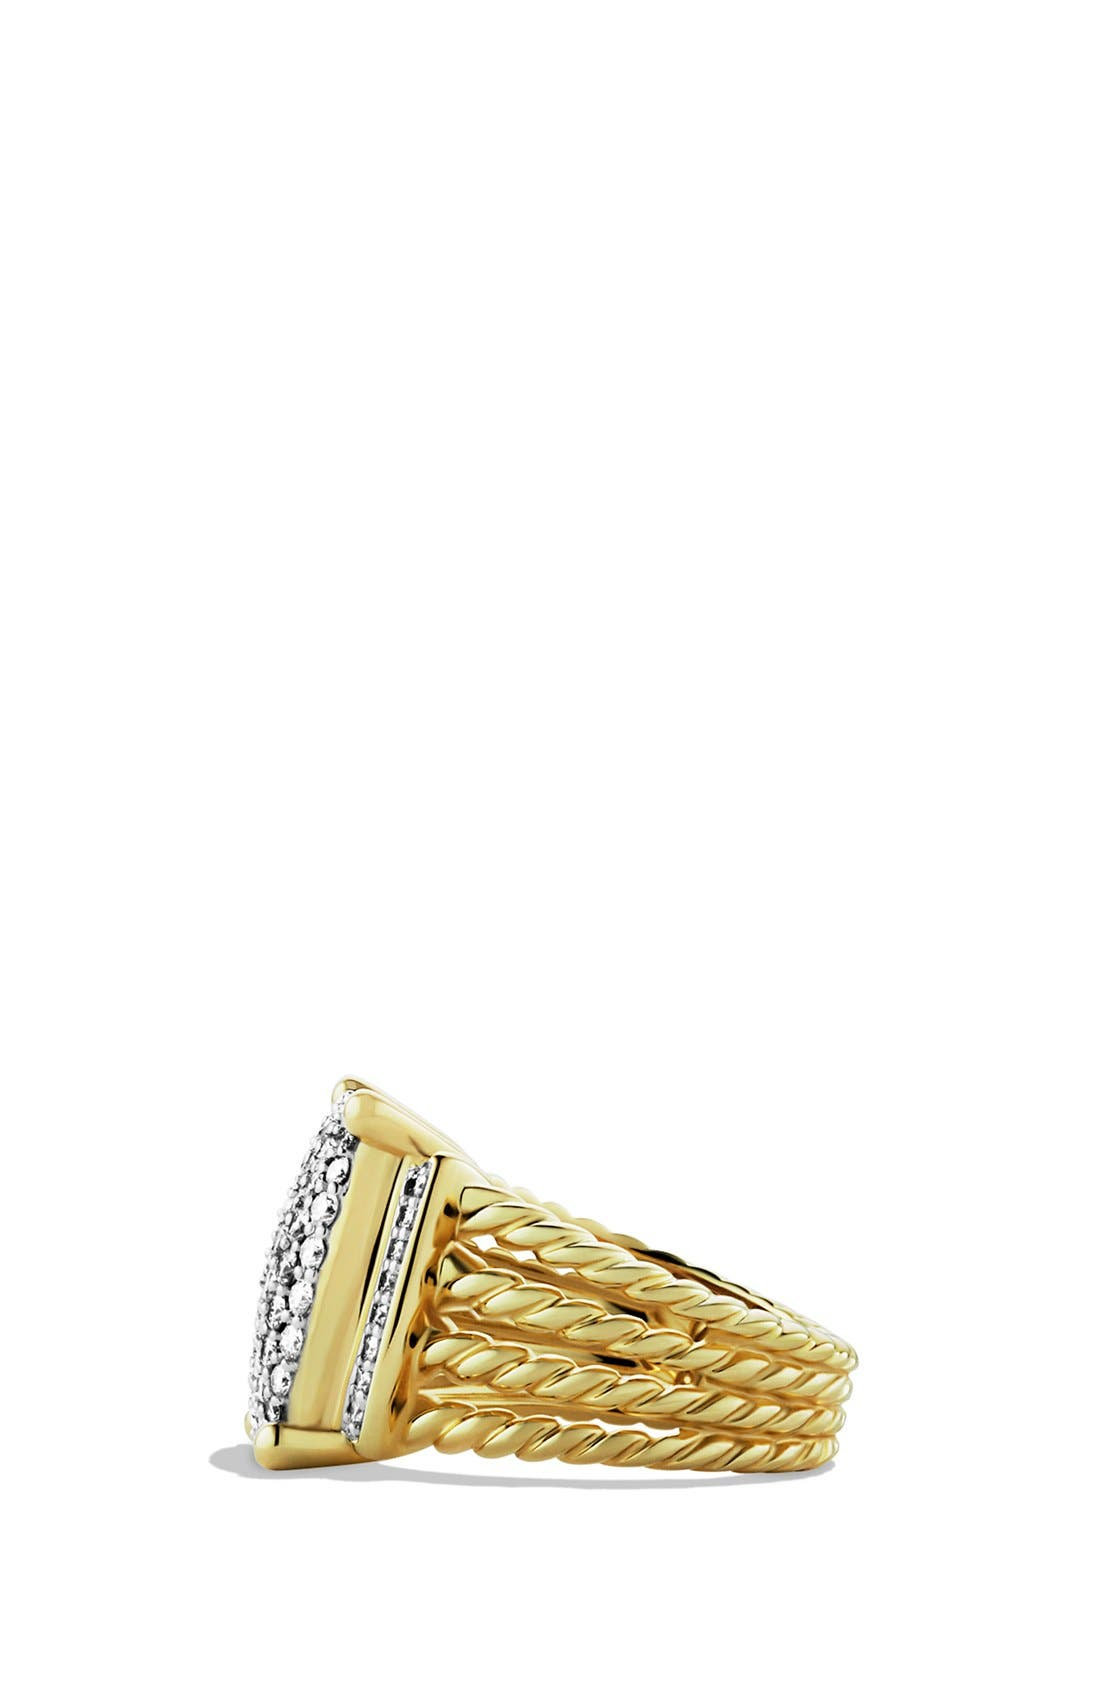 'Wheaton' Ring with Diamonds in Gold,                             Alternate thumbnail 2, color,                             Diamond